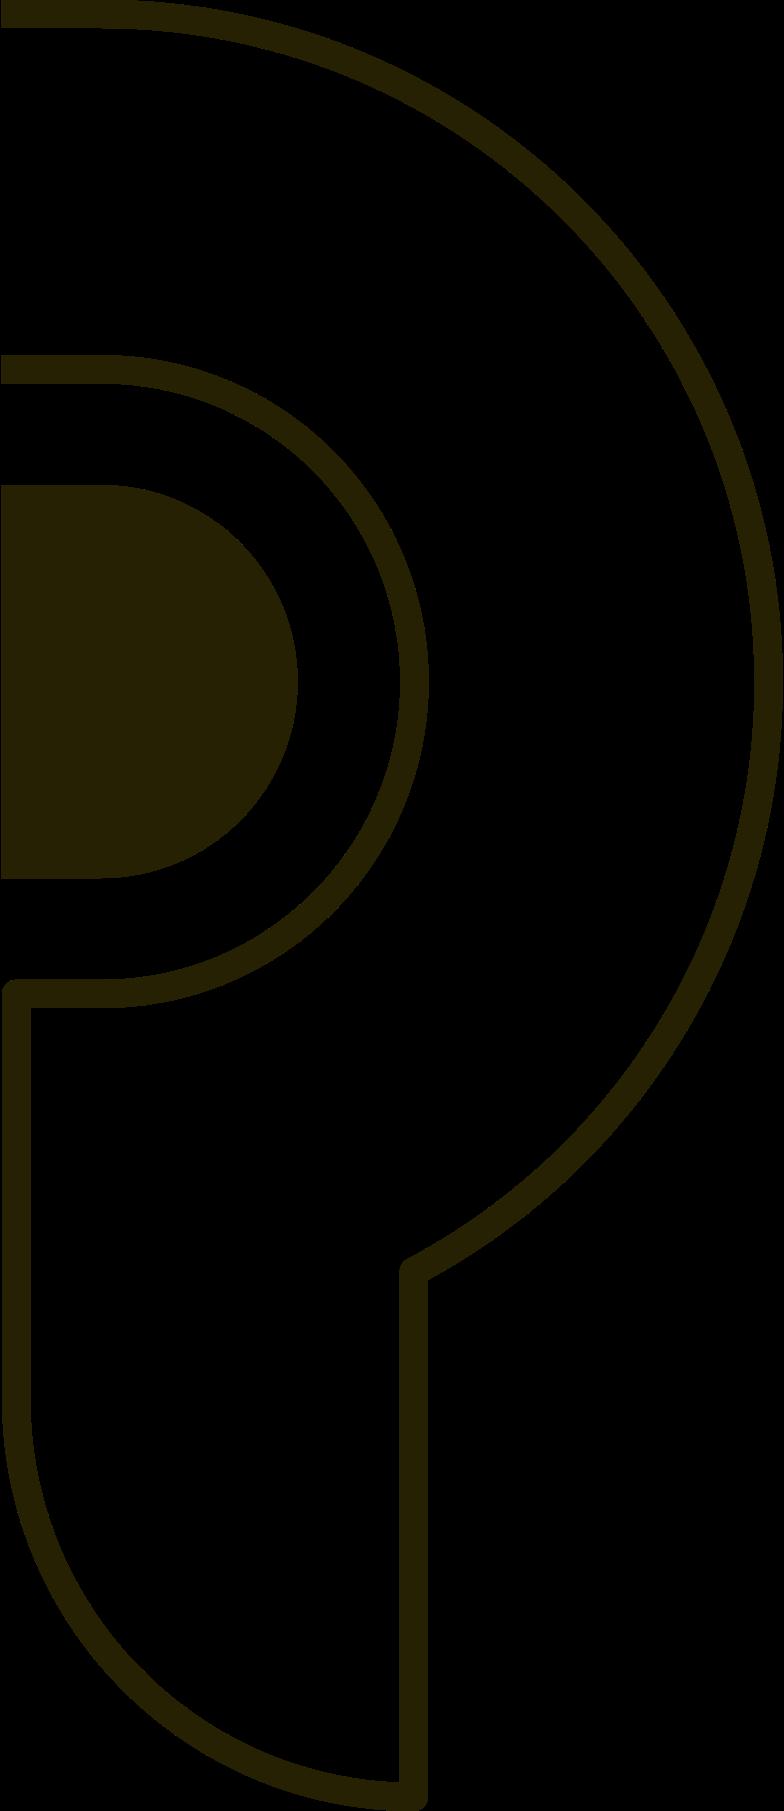 ear Clipart illustration in PNG, SVG